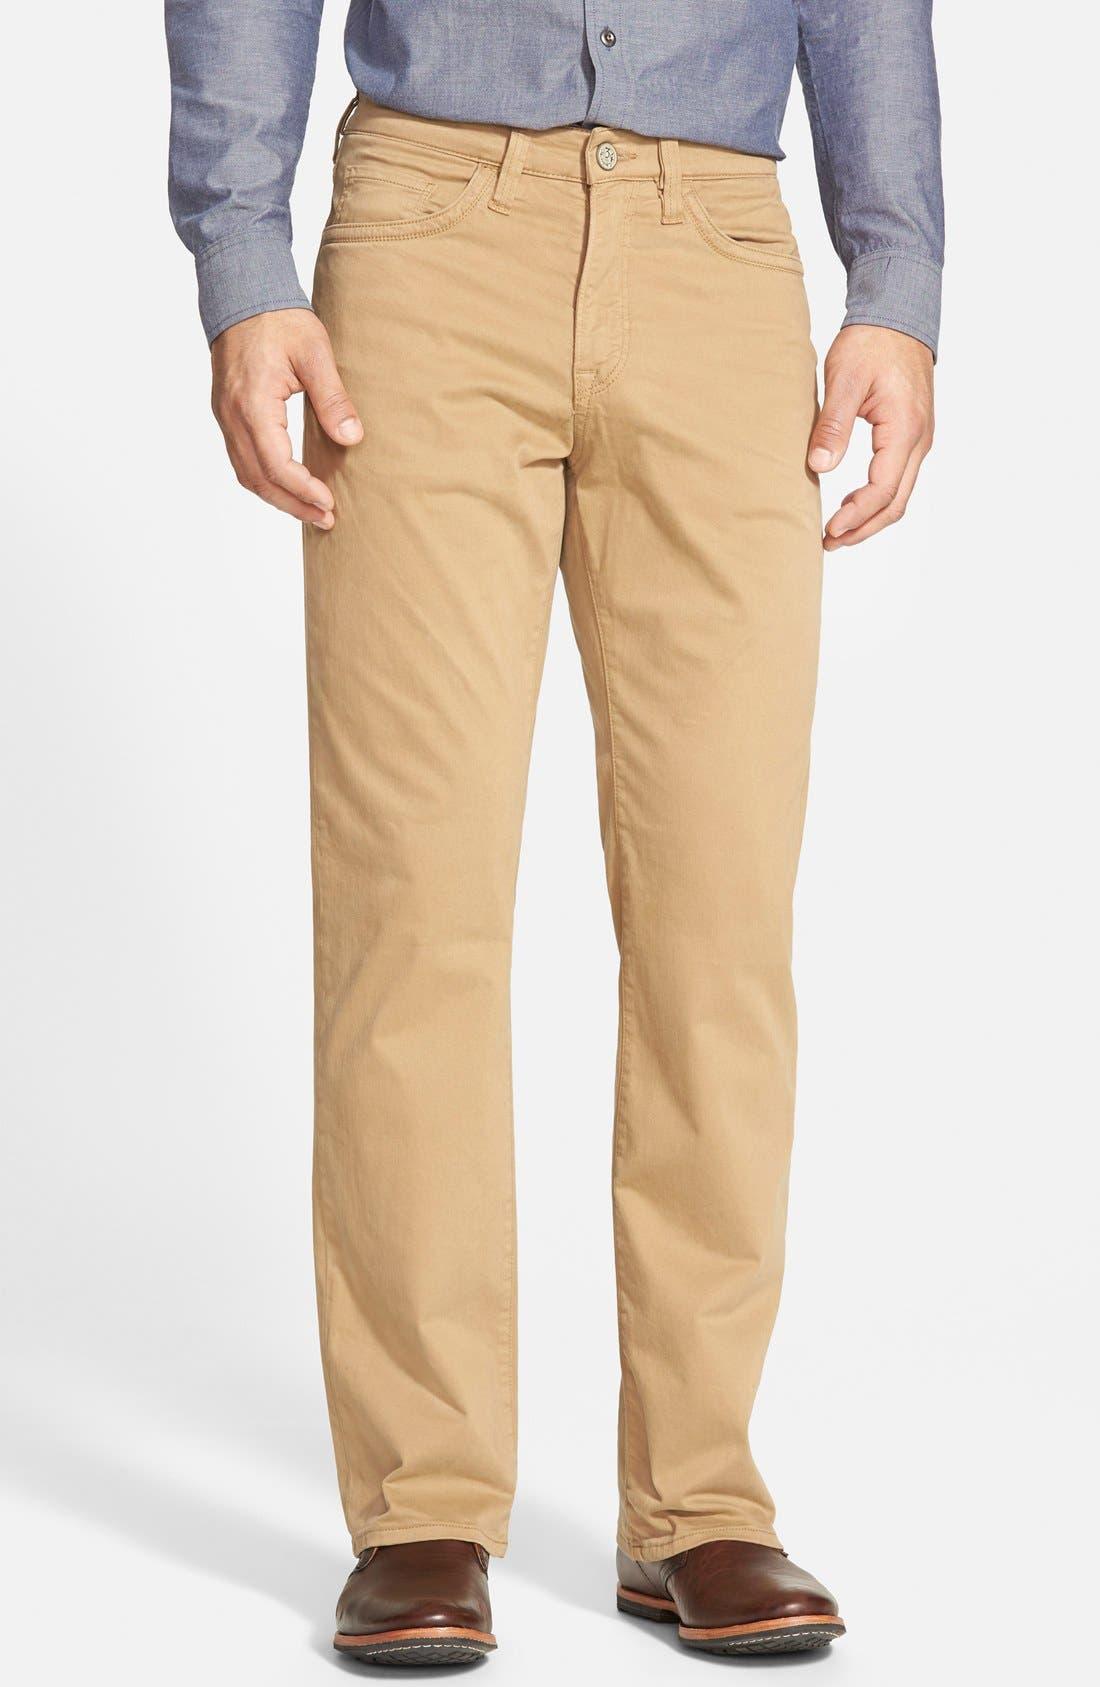 'Charisma' Classic Relaxed Fit Pants,                             Main thumbnail 1, color,                             BEIGE/ KHAKI